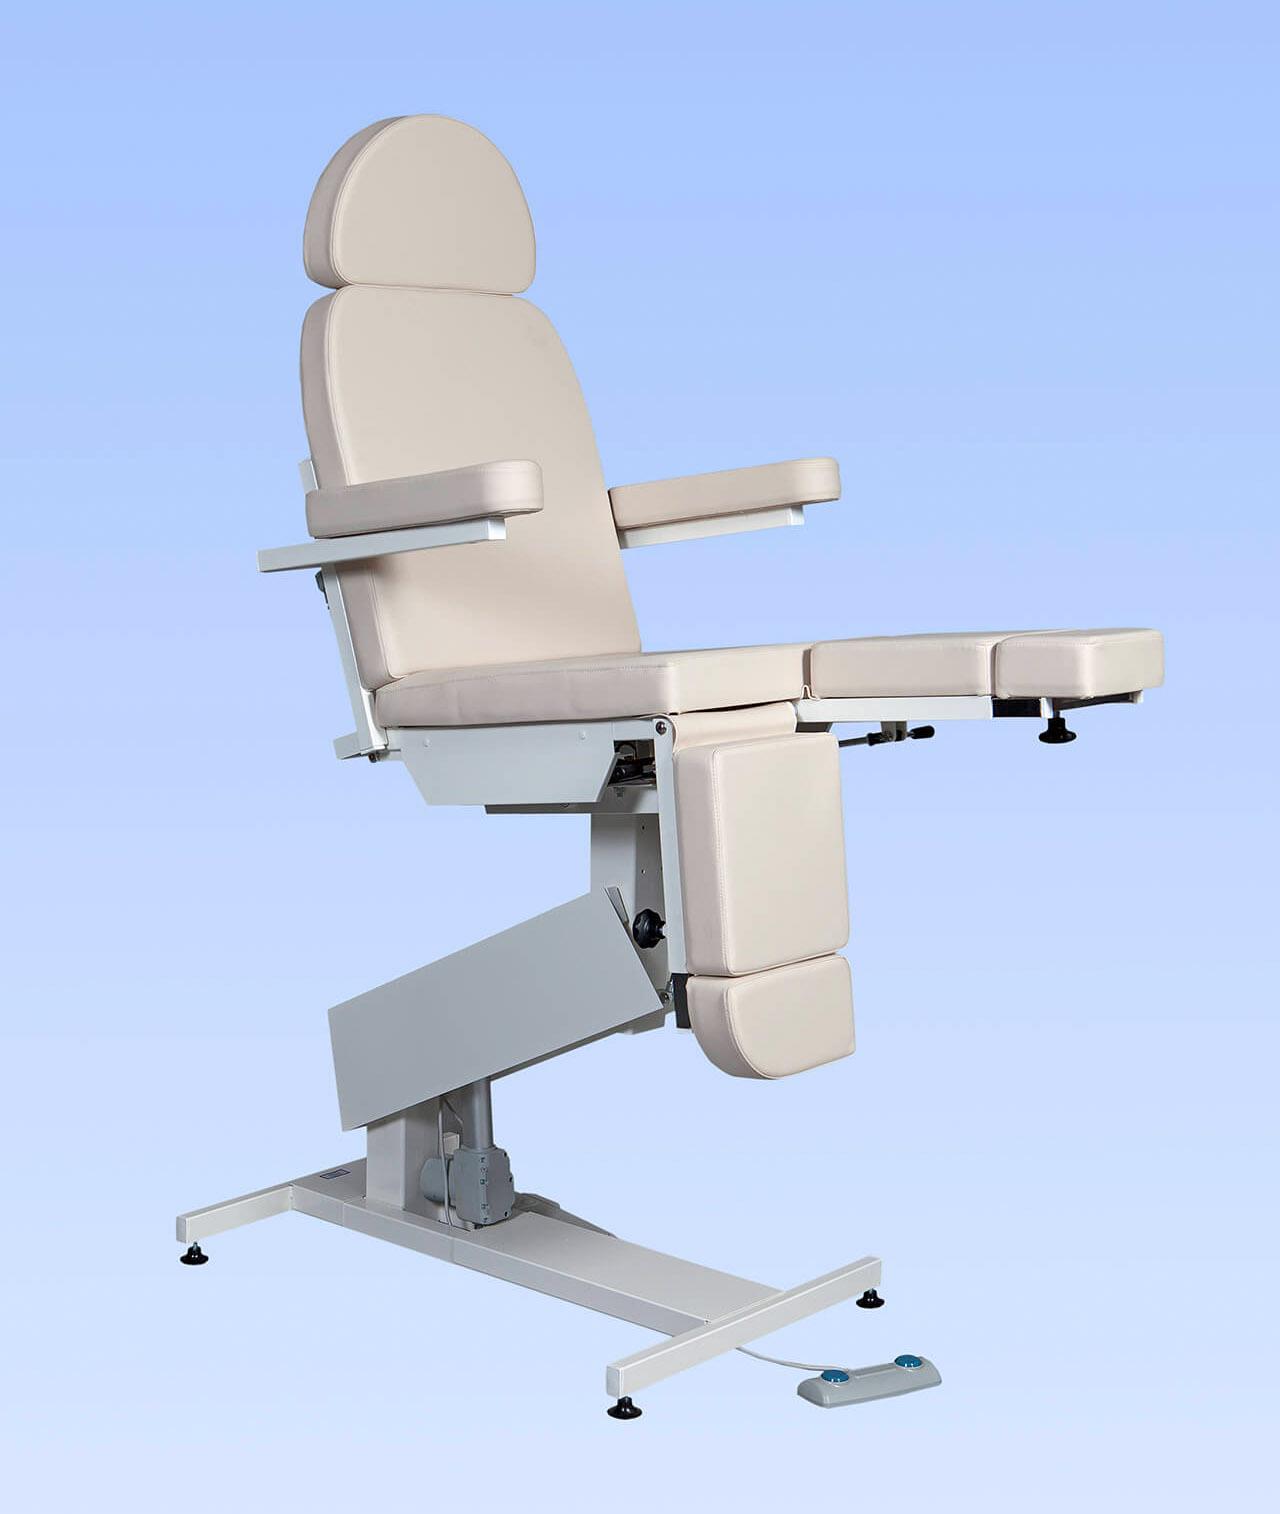 Girovi Seats